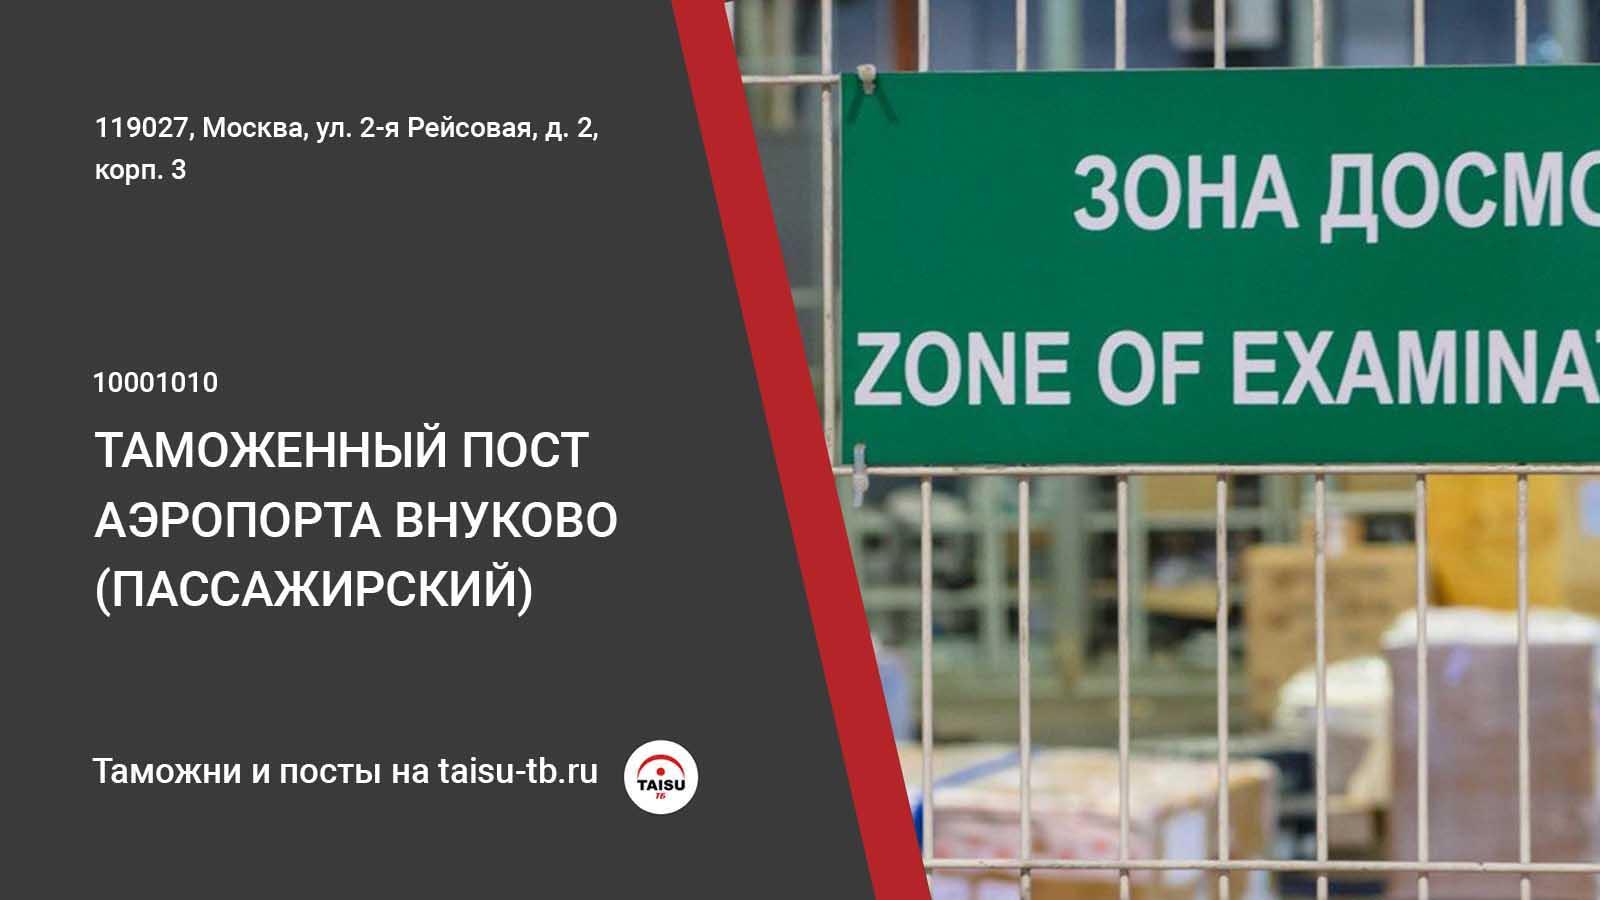 Таможенный пост Аэропорт Внуково (пассажирский)